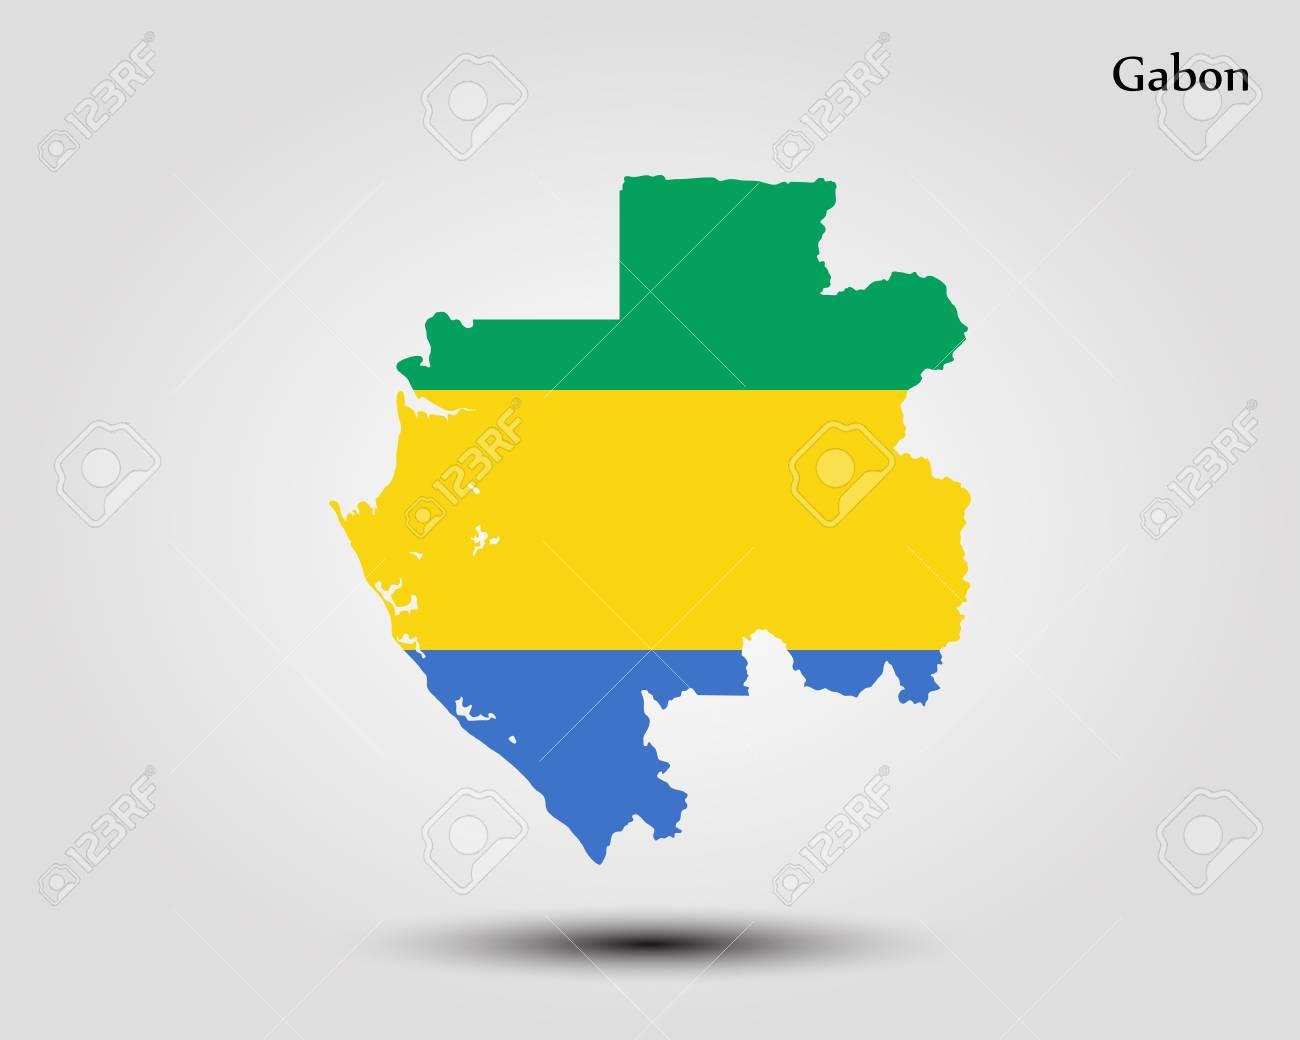 Gabon World Map.Map Of Gabon Vector Illustration World Map Royalty Free Cliparts